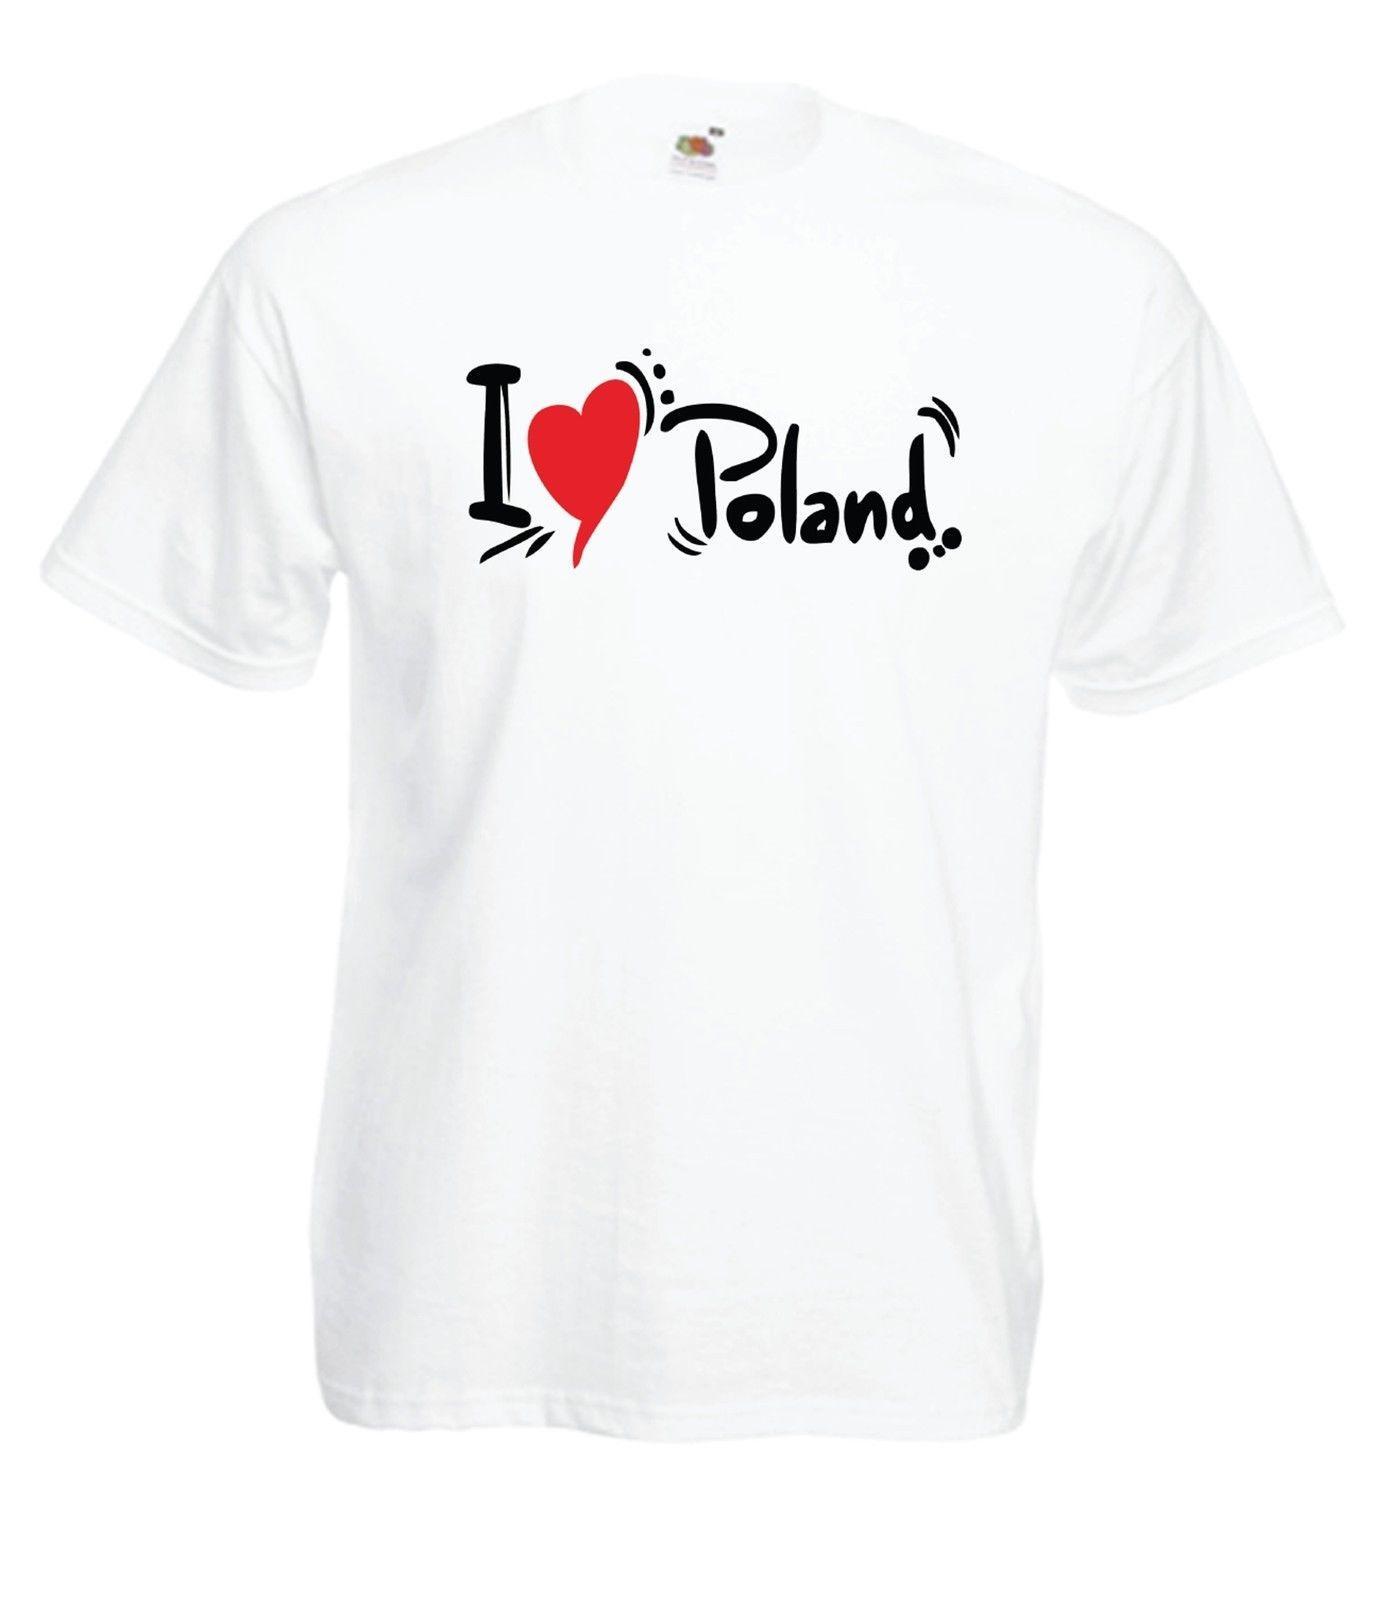 08c43a587 I LOVE POLAND Polska Polish Revolution Che Guevara New Mens Womens T SHIRT  TOP Mens T Shirts Funny Shirts From Summernight88, $11.48| DHgate.Com